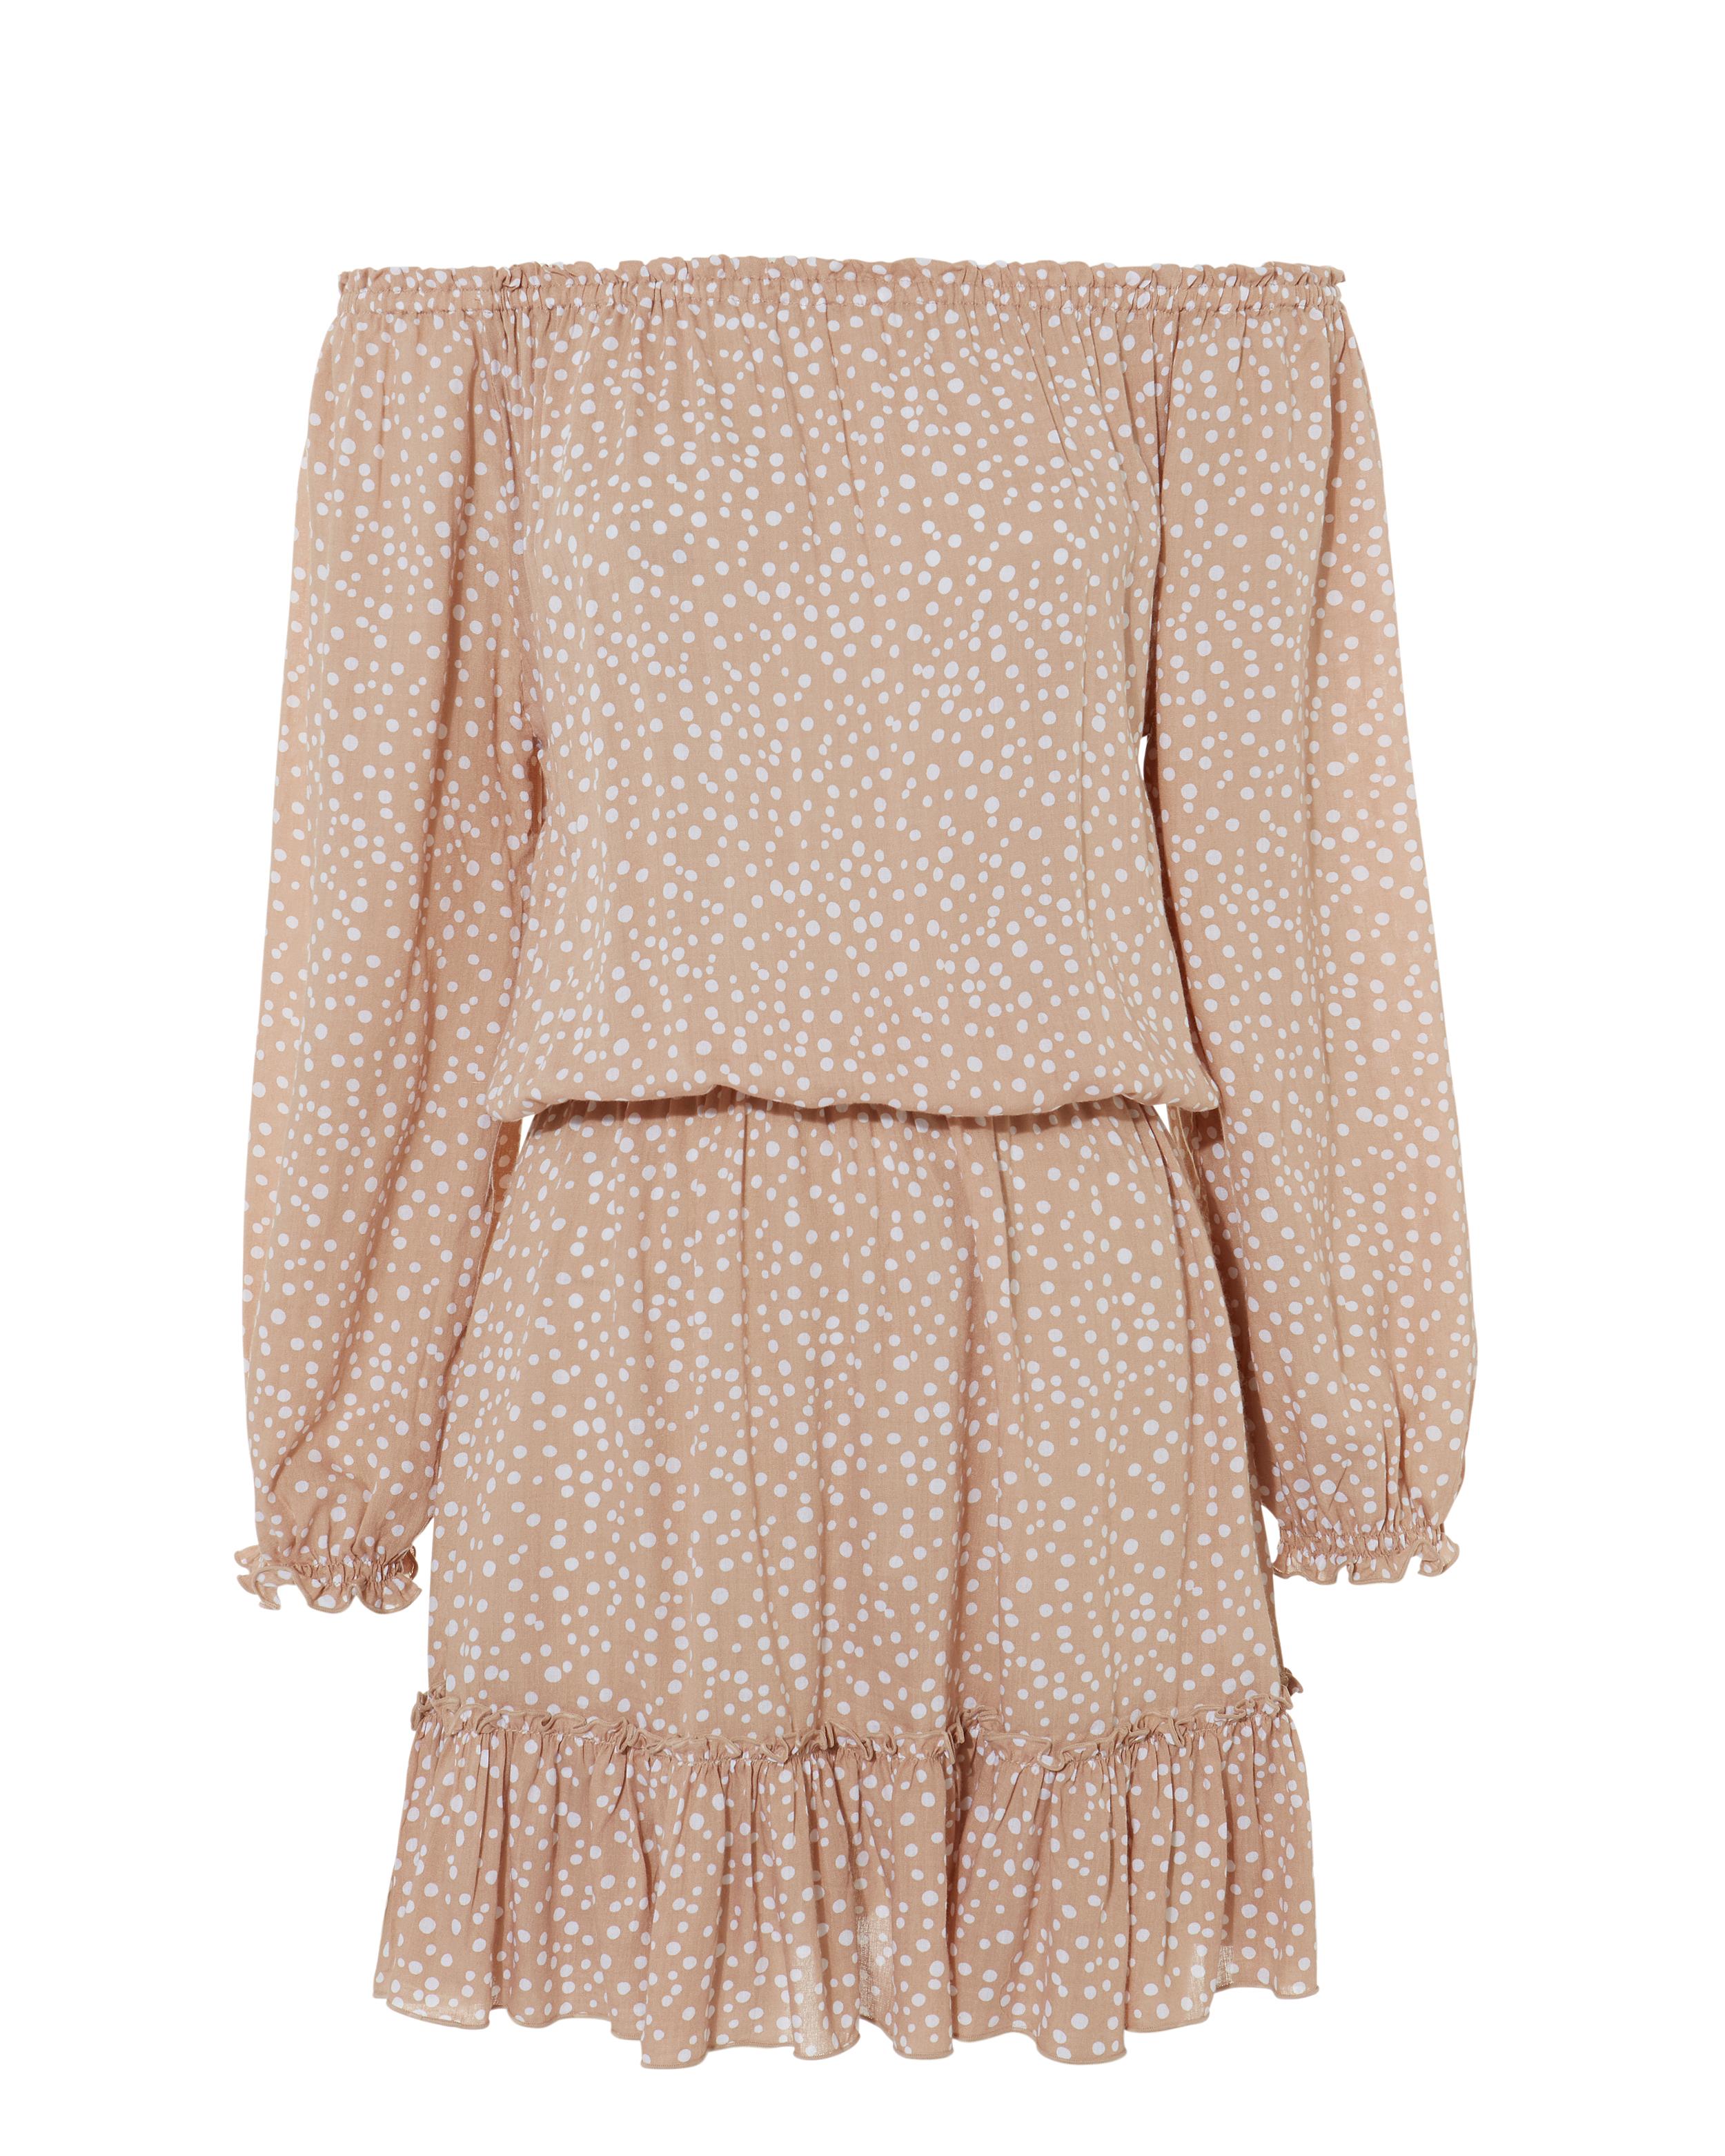 COOLCHANGE Madelyn Tunic Dress